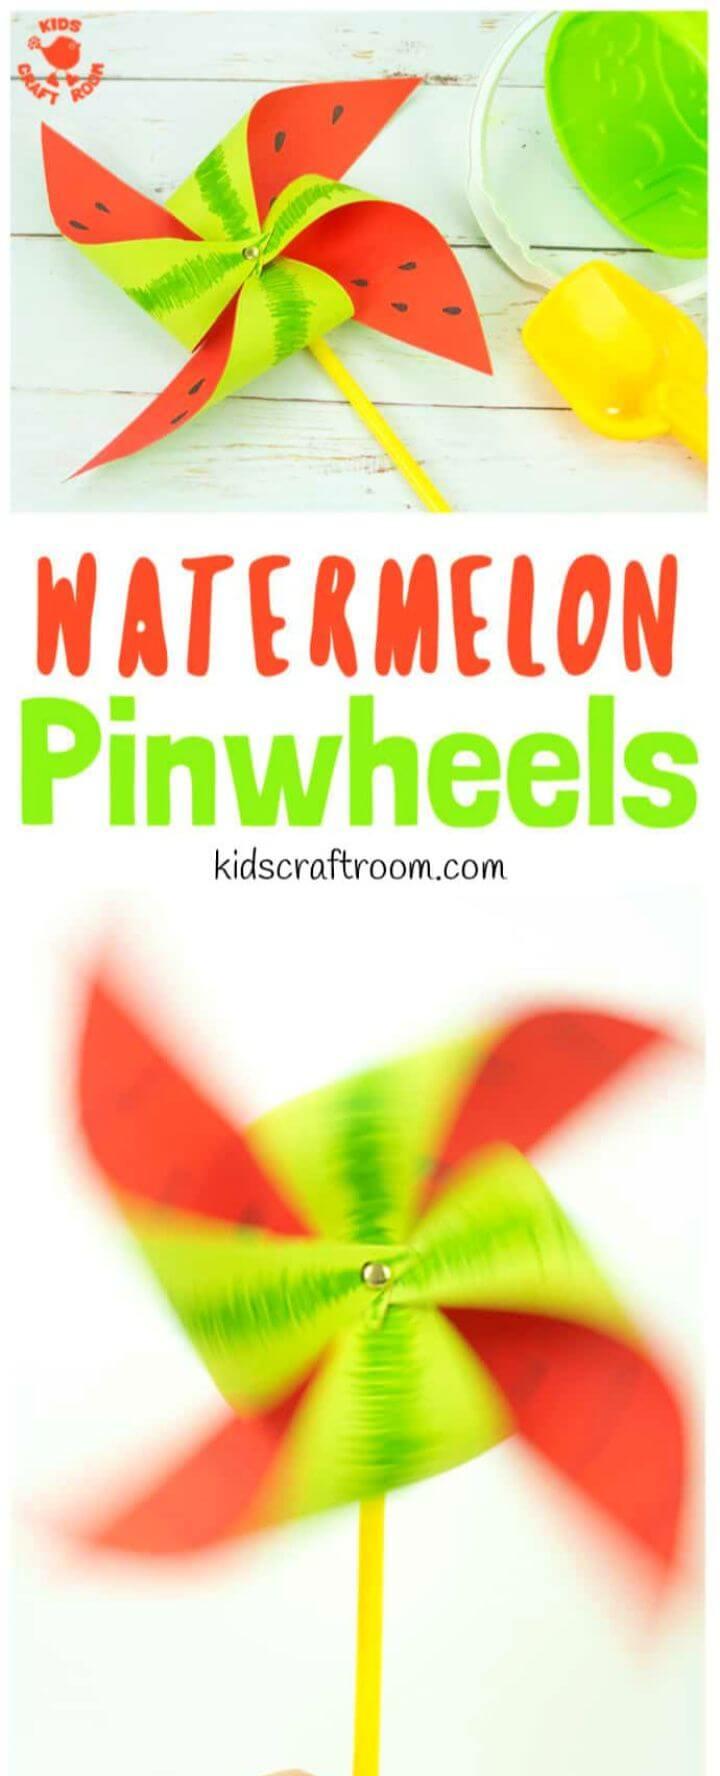 Easy DIY Watermelon Pinwheel Craft